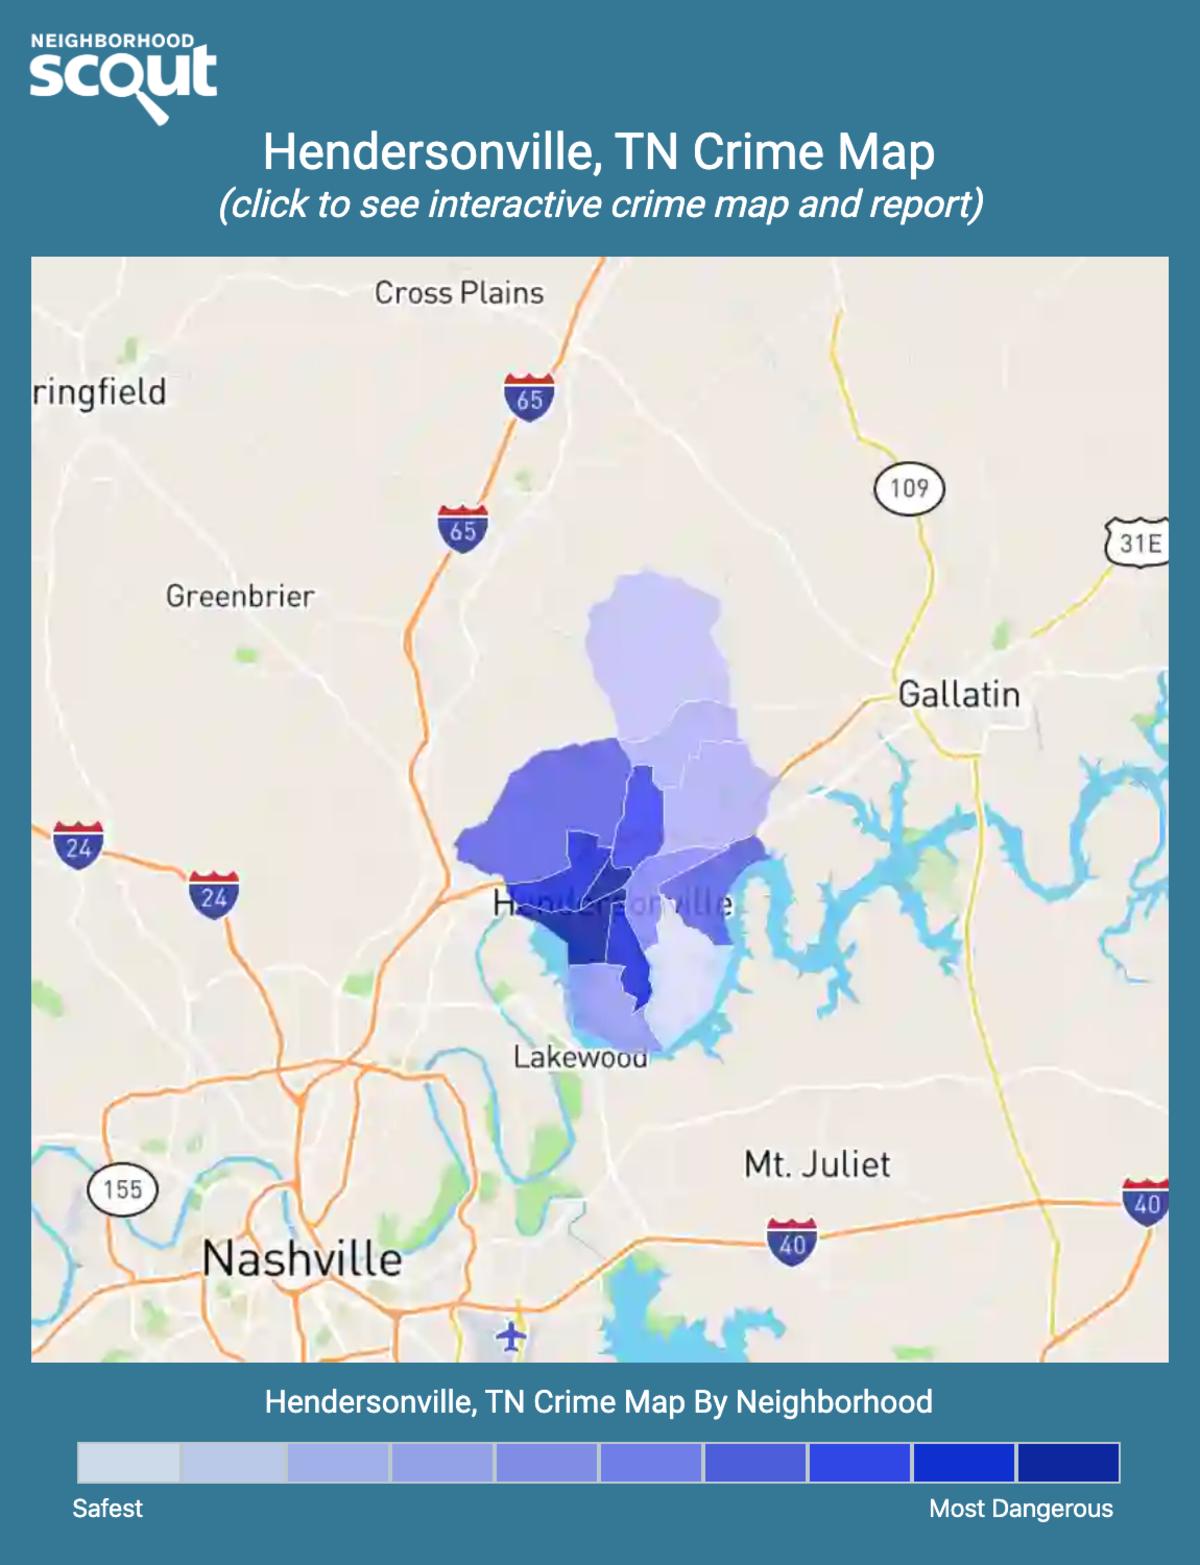 Hendersonville, Tennessee crime map